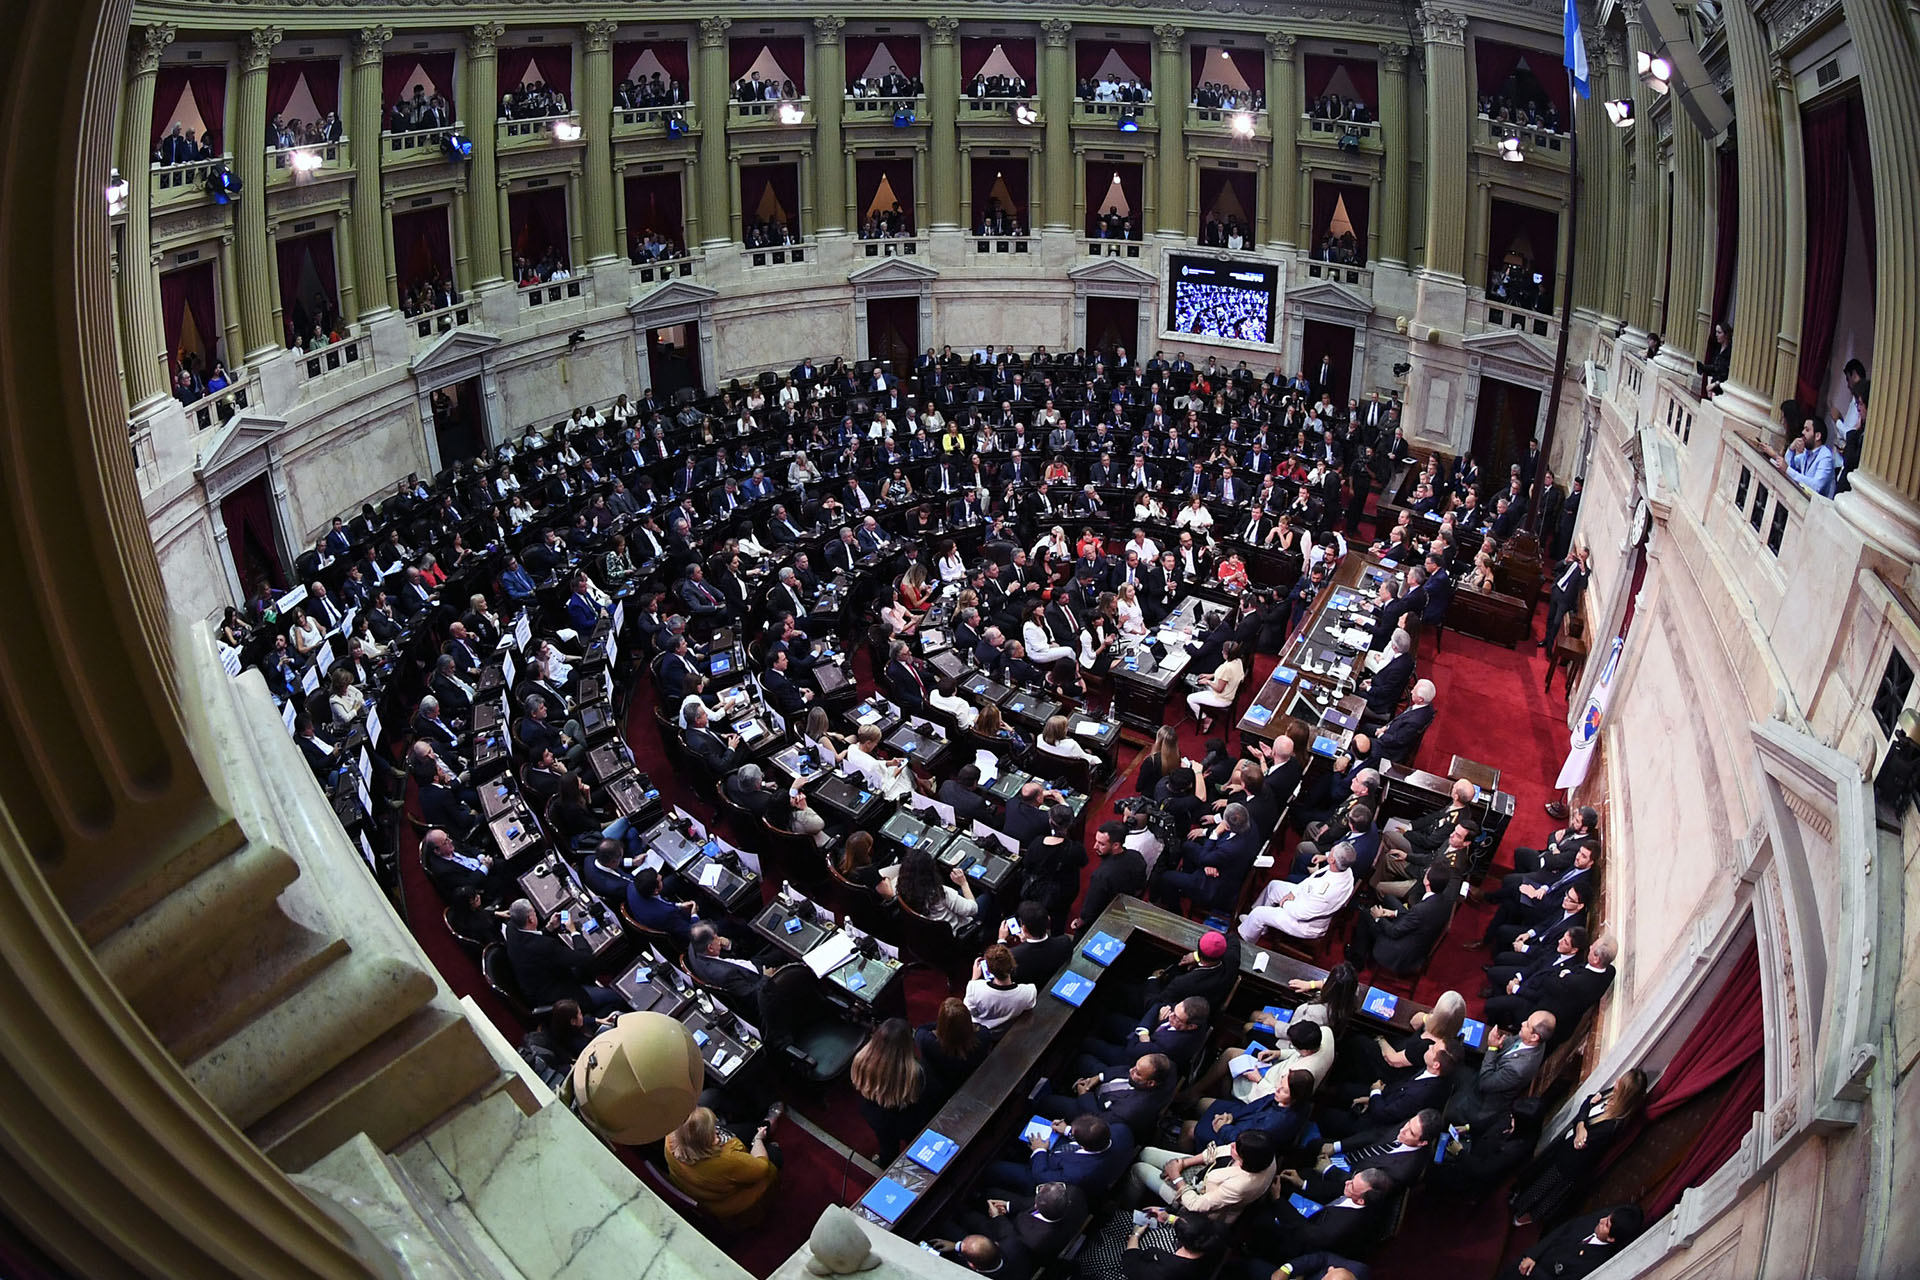 Imagen panorámica de la Cámara de Diputados